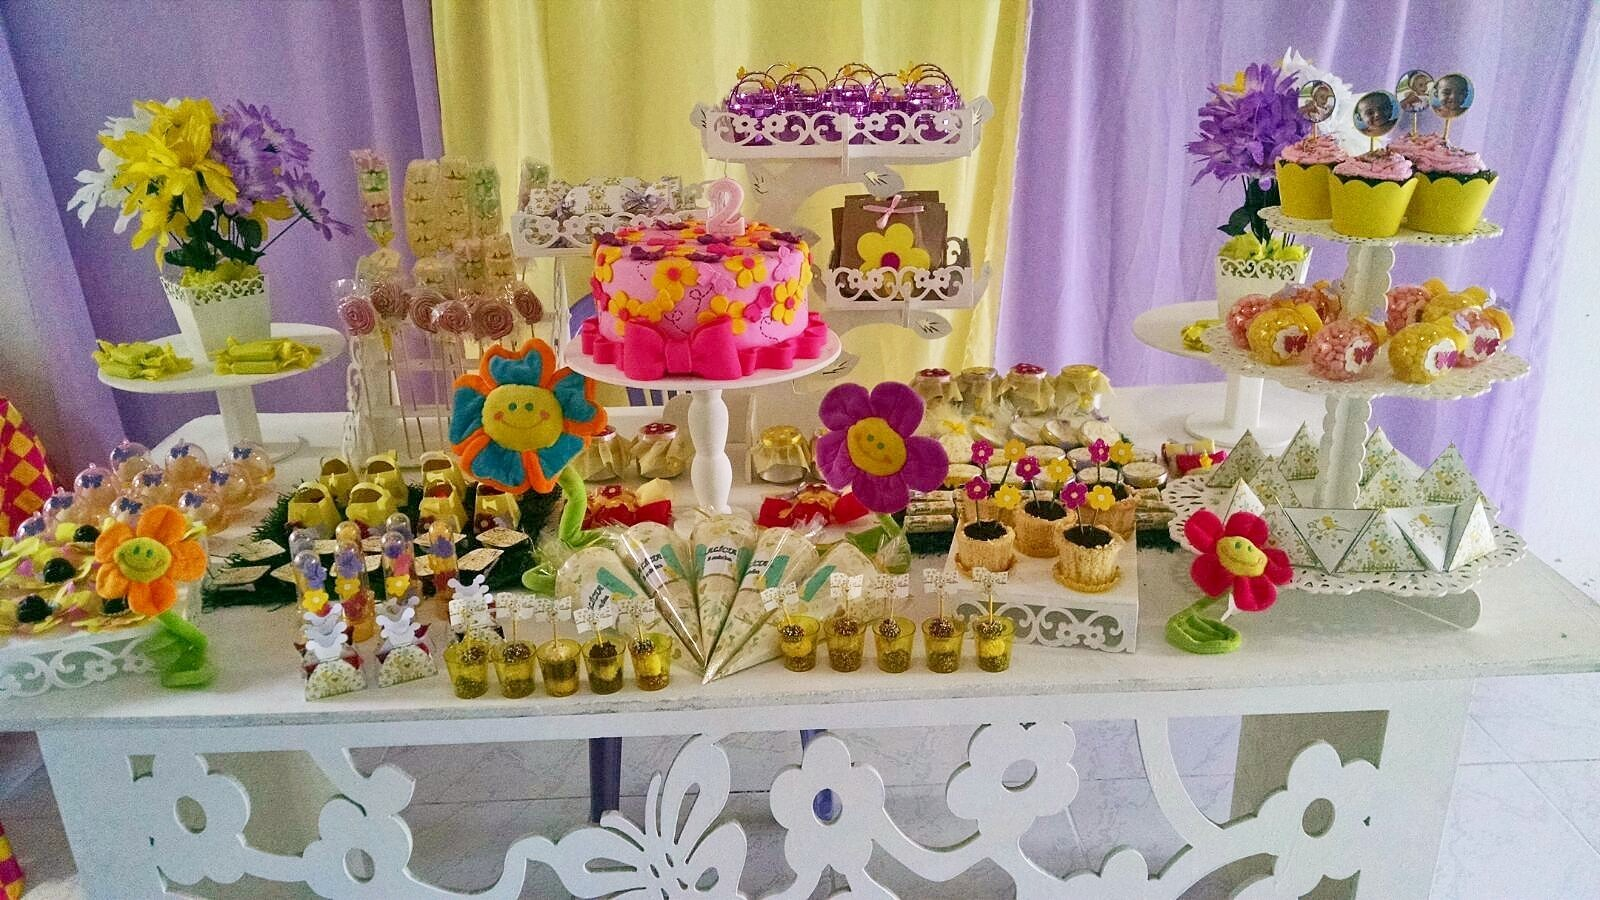 decoracao infantil jardim das borboletas:decora o festa jardim encantado decora o festa jardim encantado Car